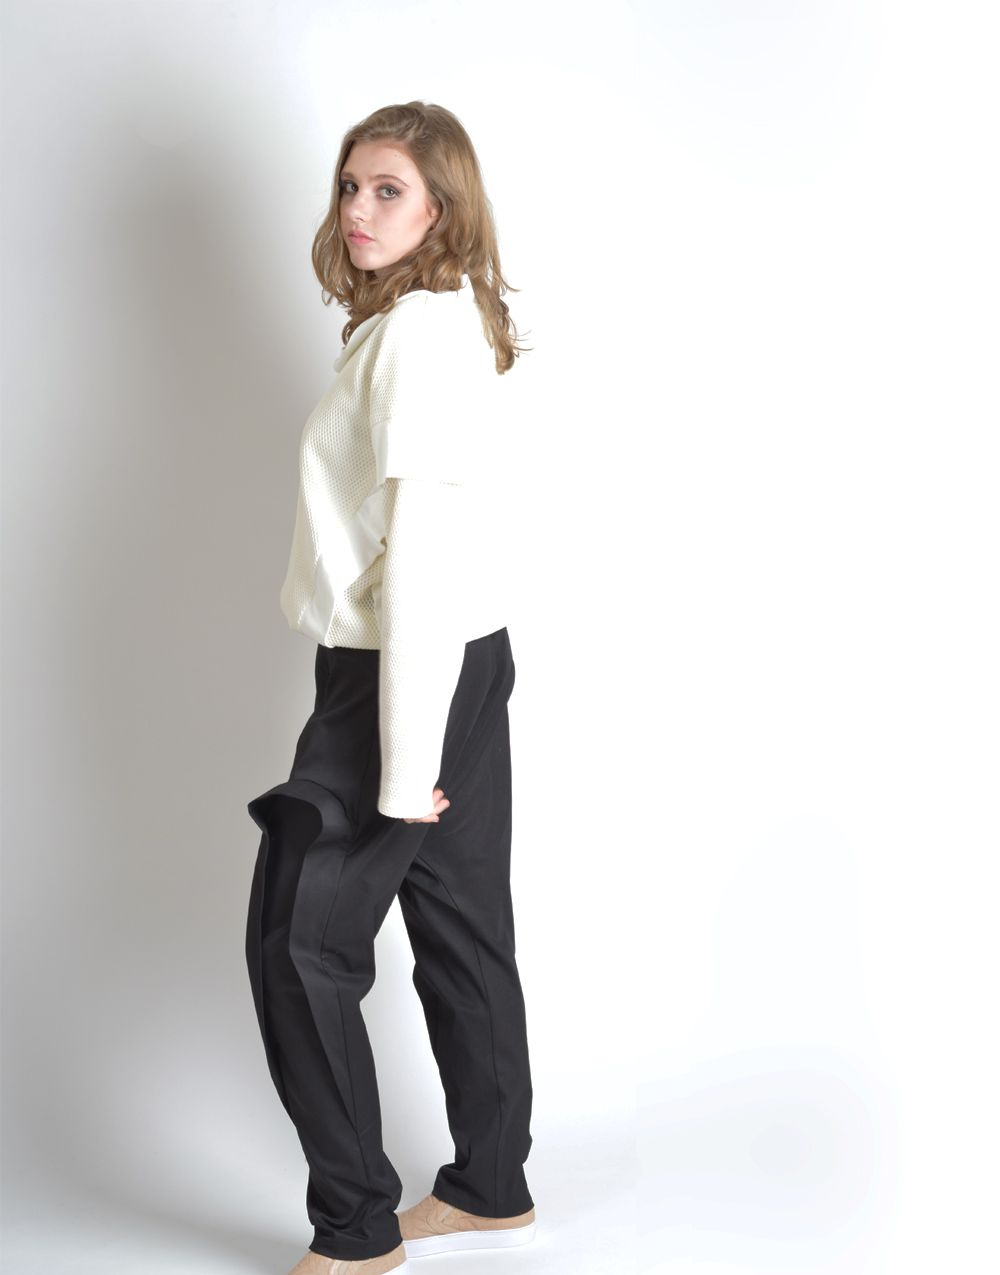 22f894c5925 Tag Mens Urban Clothing Plus Size — waldon.protese-de-silicone.info